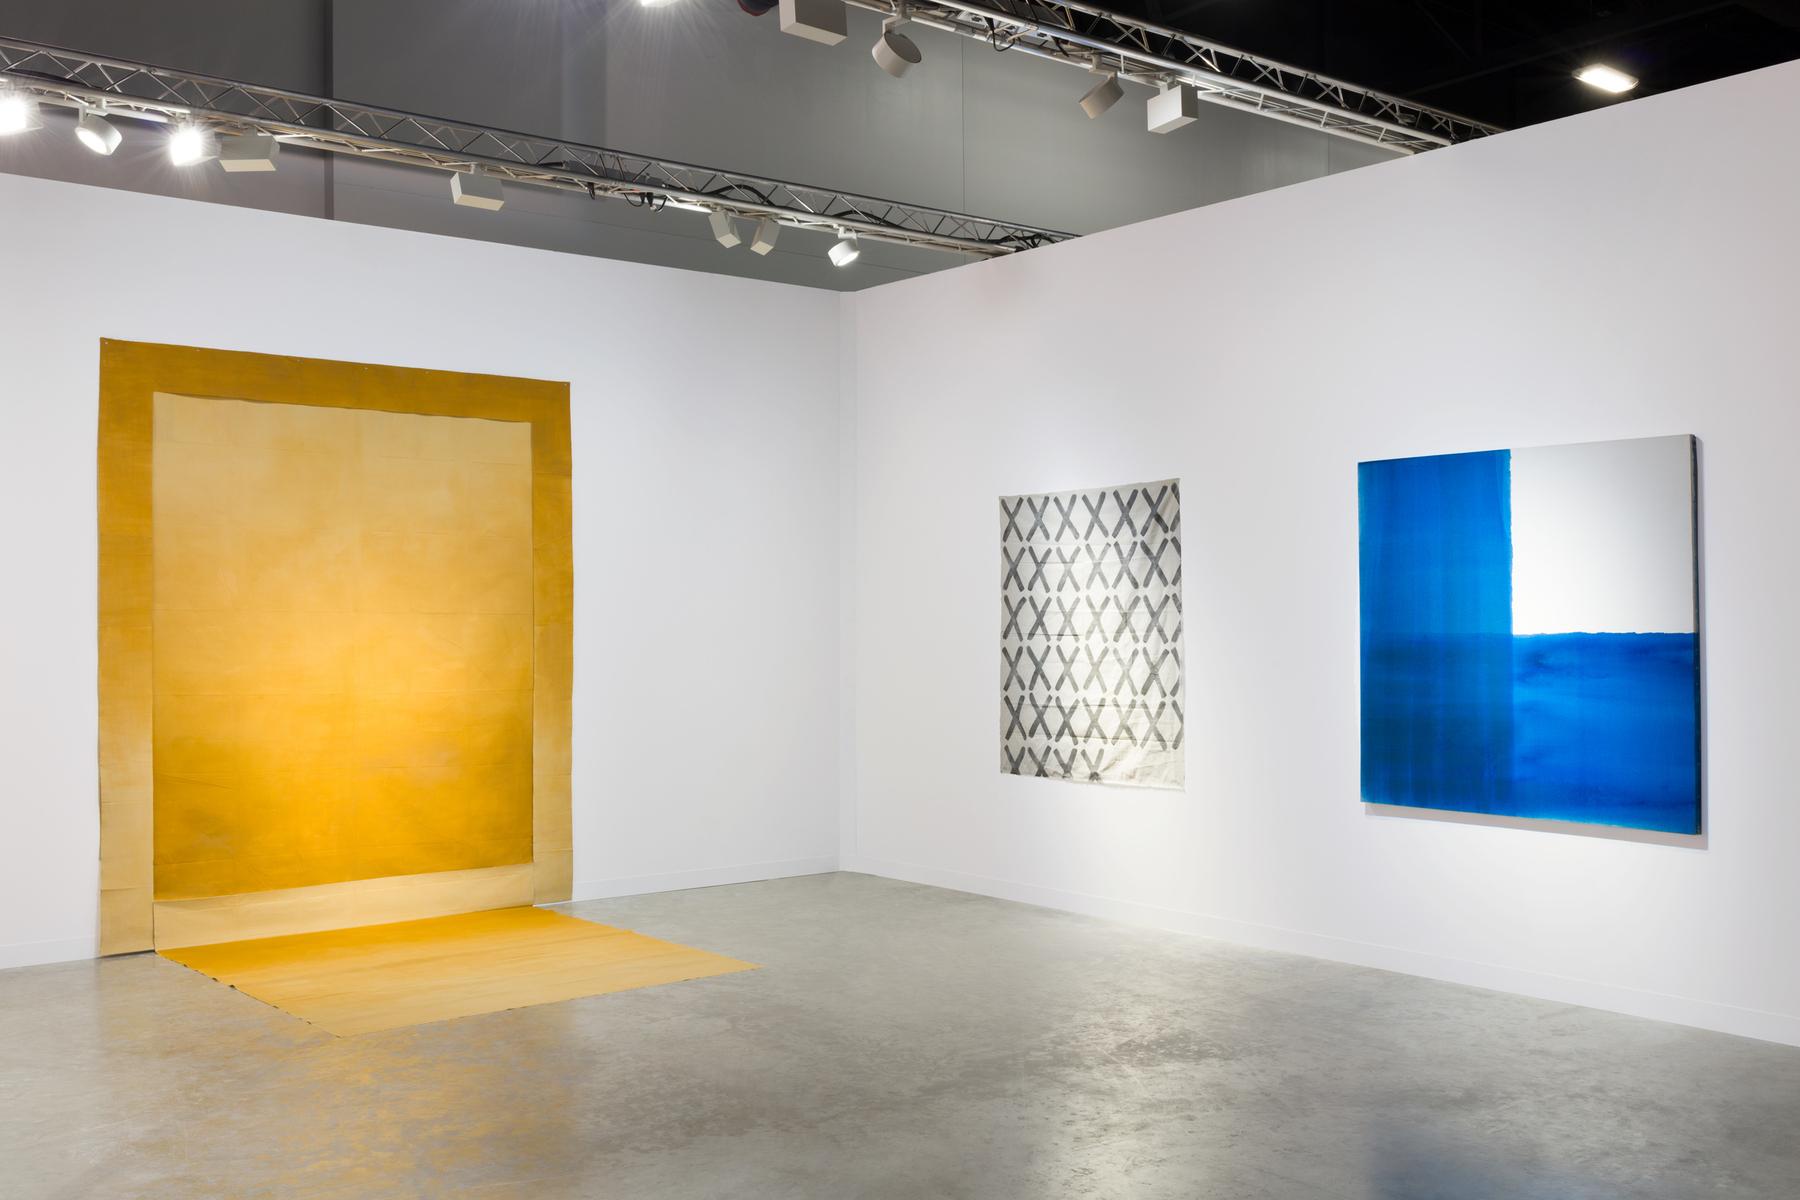 1_Art Basel Miami Beac 2018 70